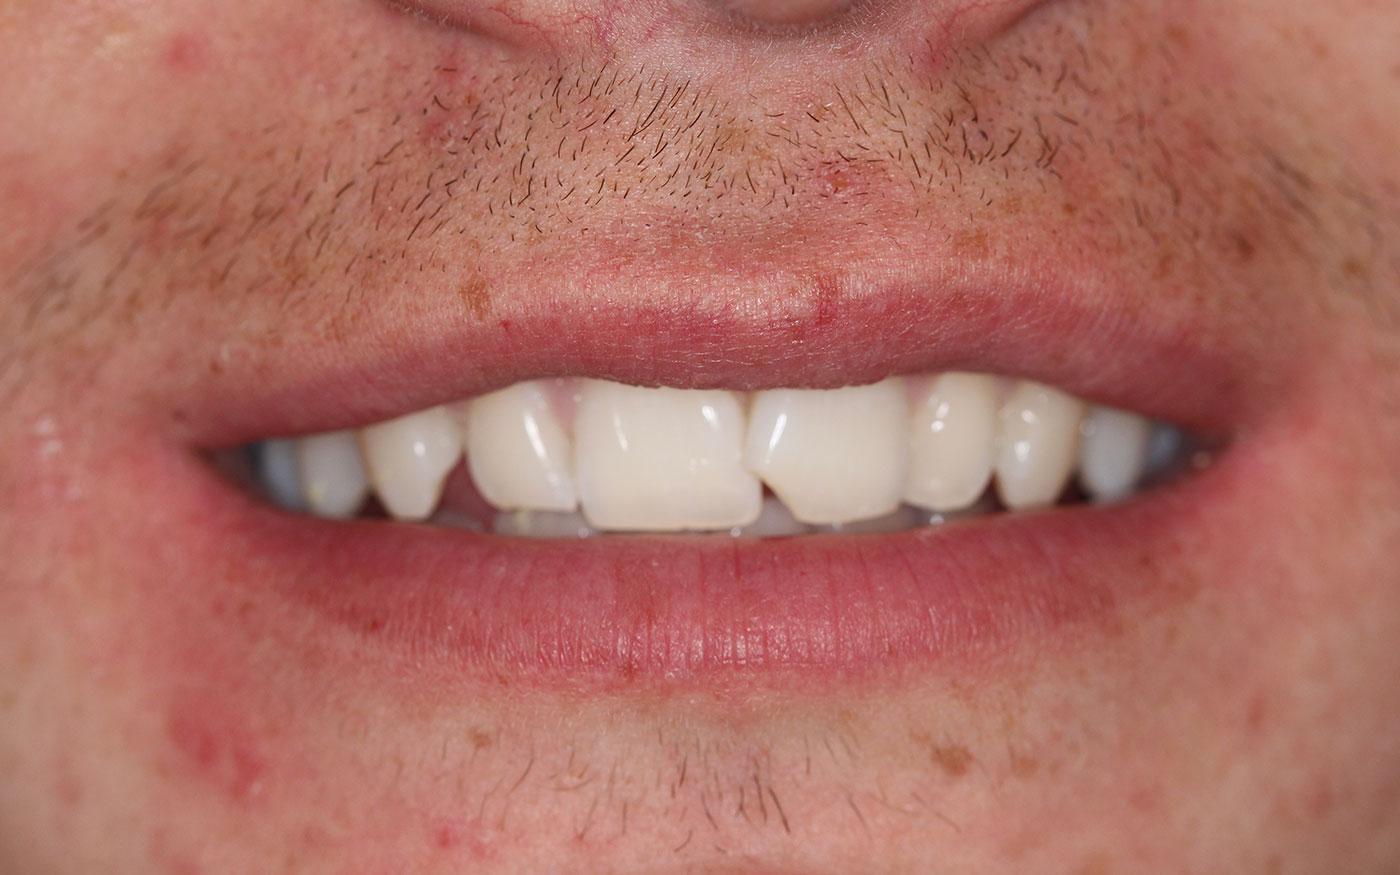 Orthodontics - Clear Aligner - Case 1